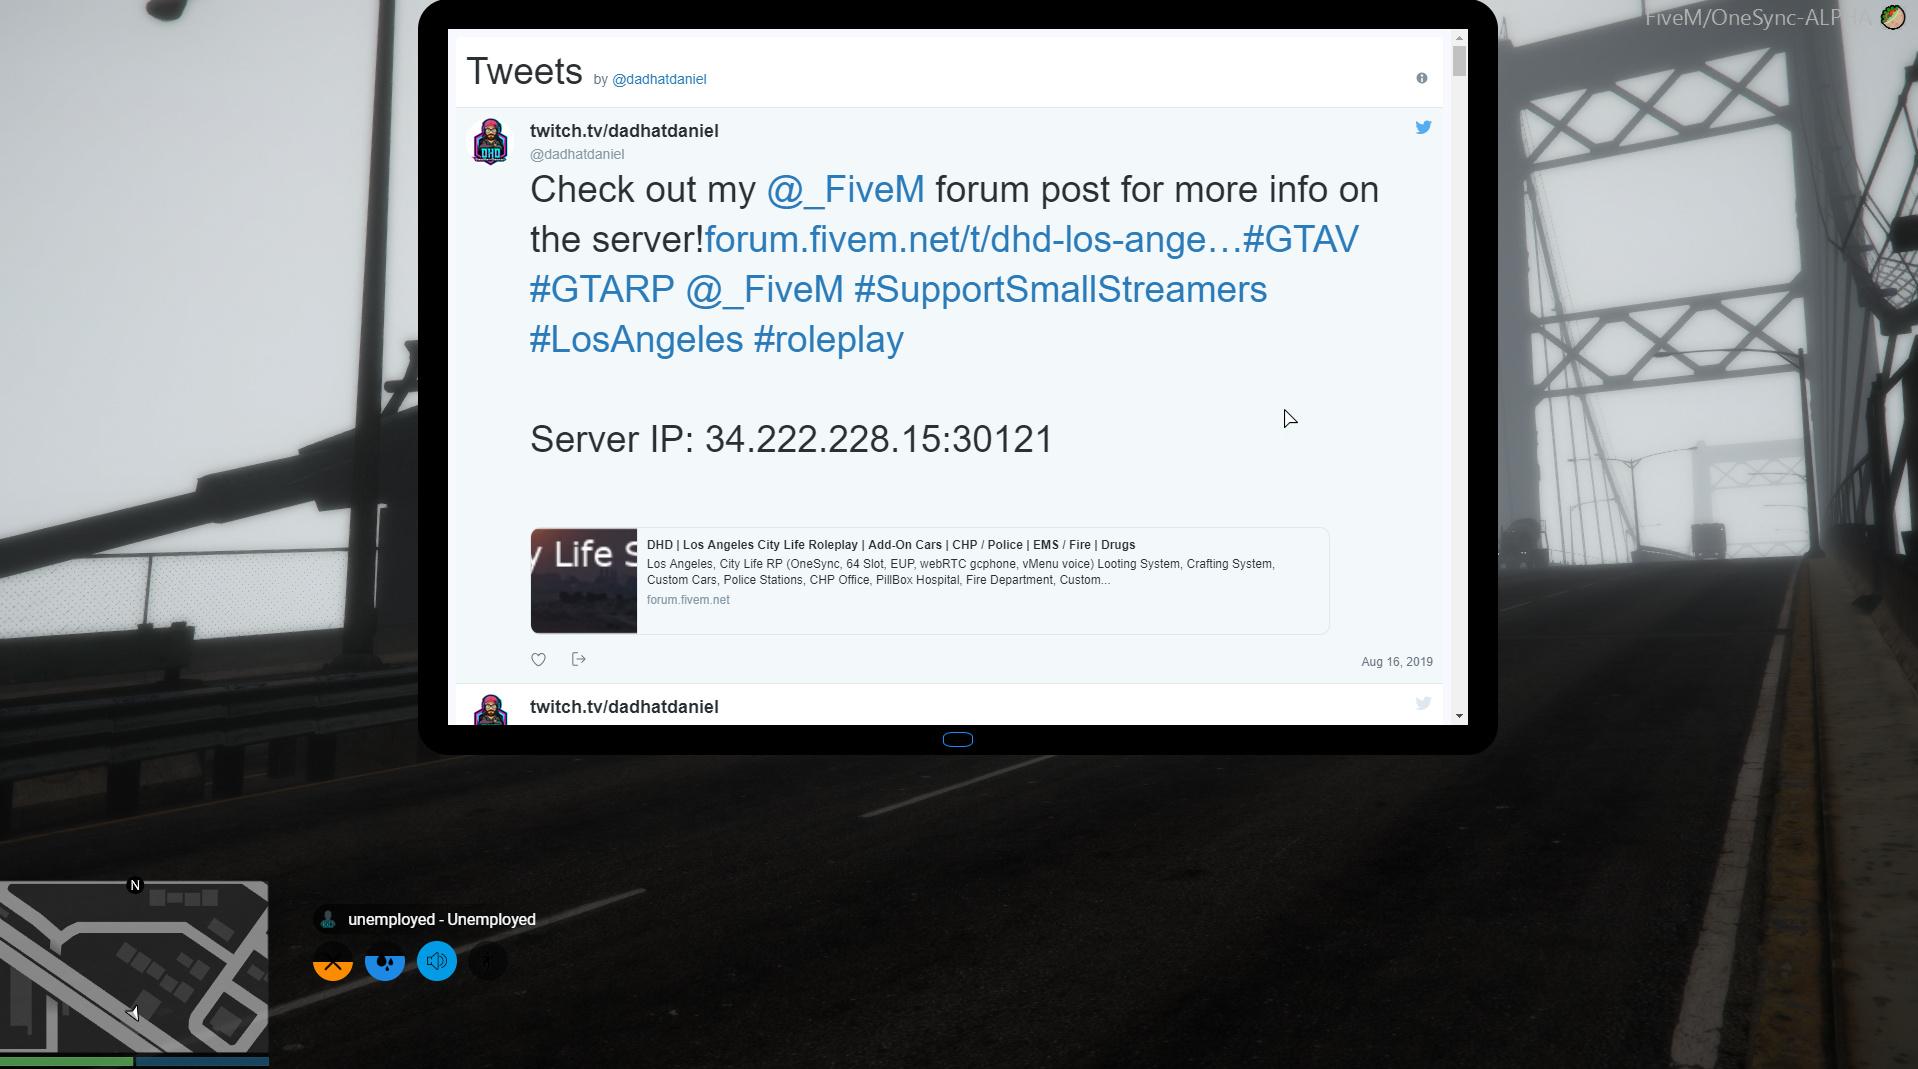 Los Angeles, City Life RP (OneSync, 64 Slot, EUP, webRTC